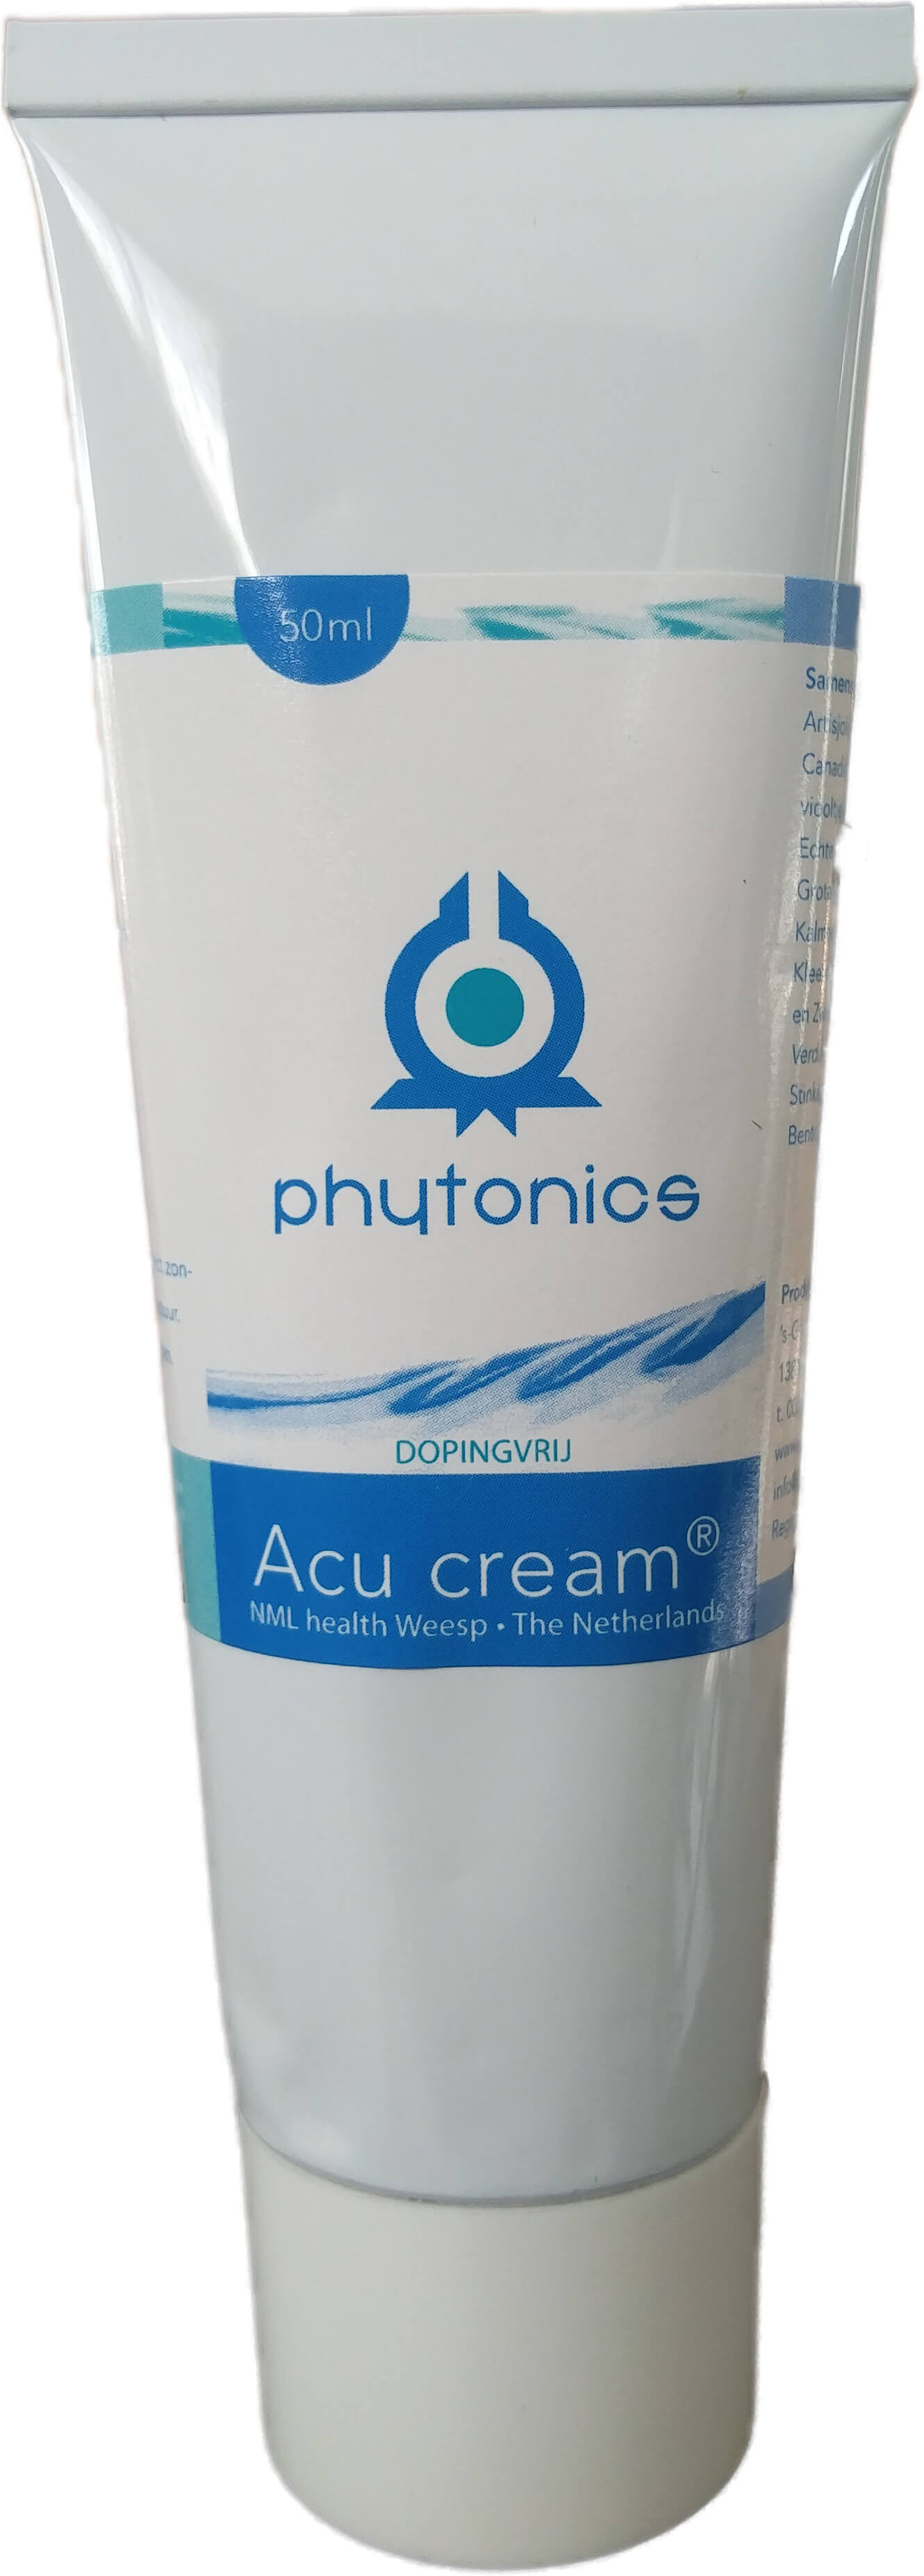 Phytonics Acu Cream